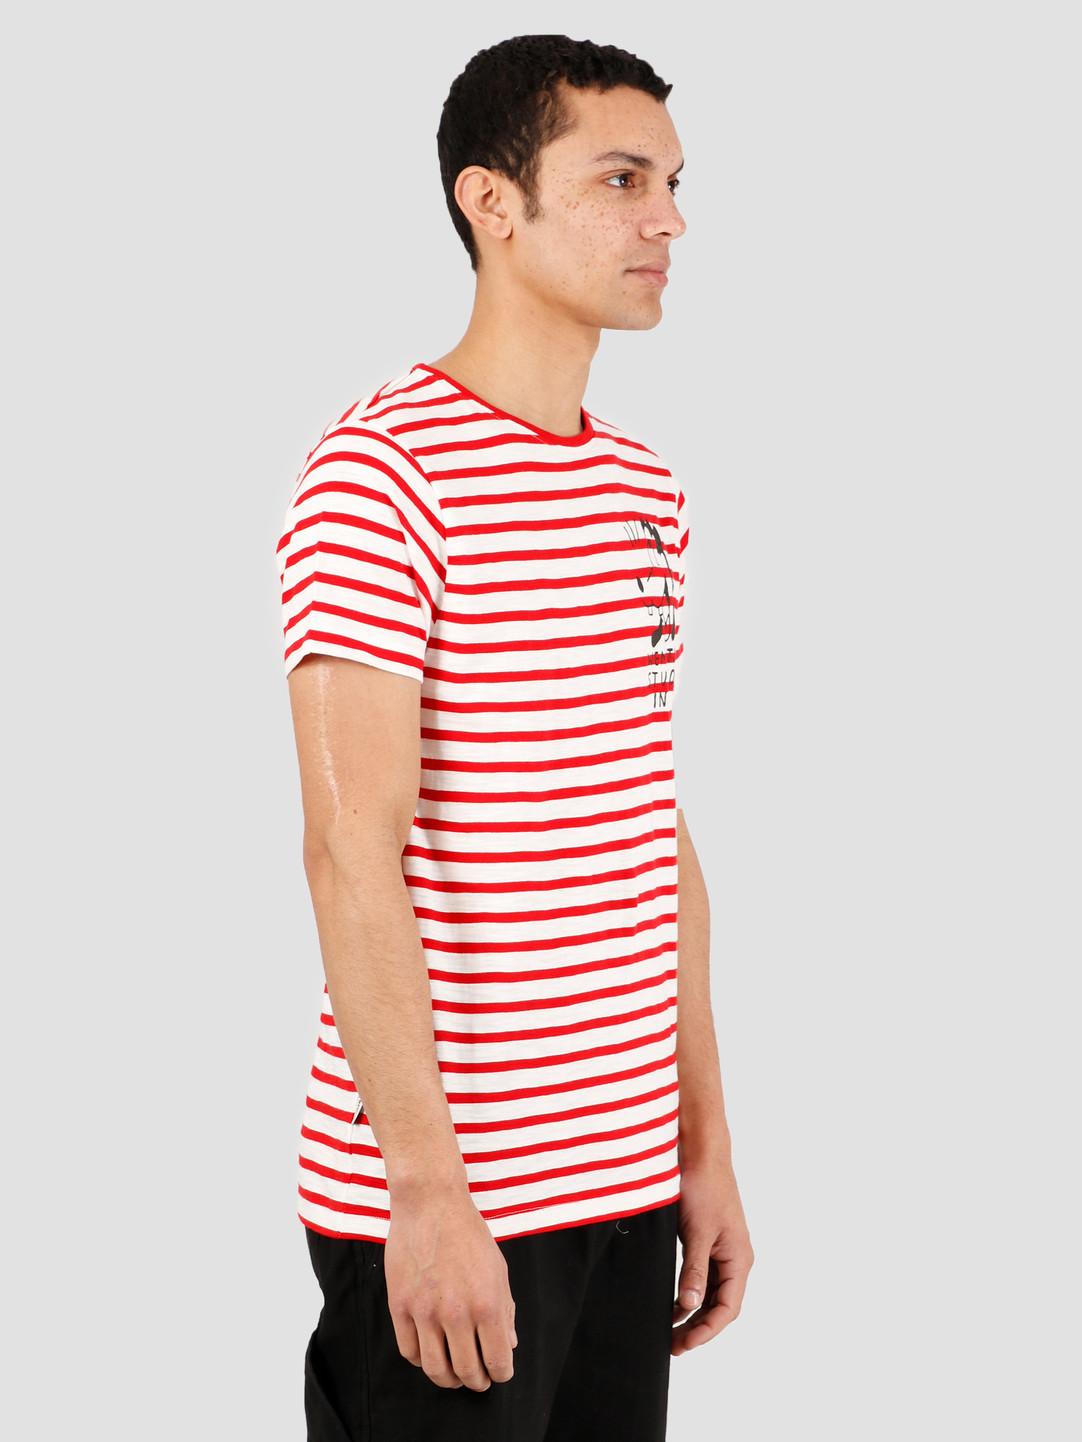 Wemoto Wemoto Tartle T-Shirt Off White Red 151.252-239